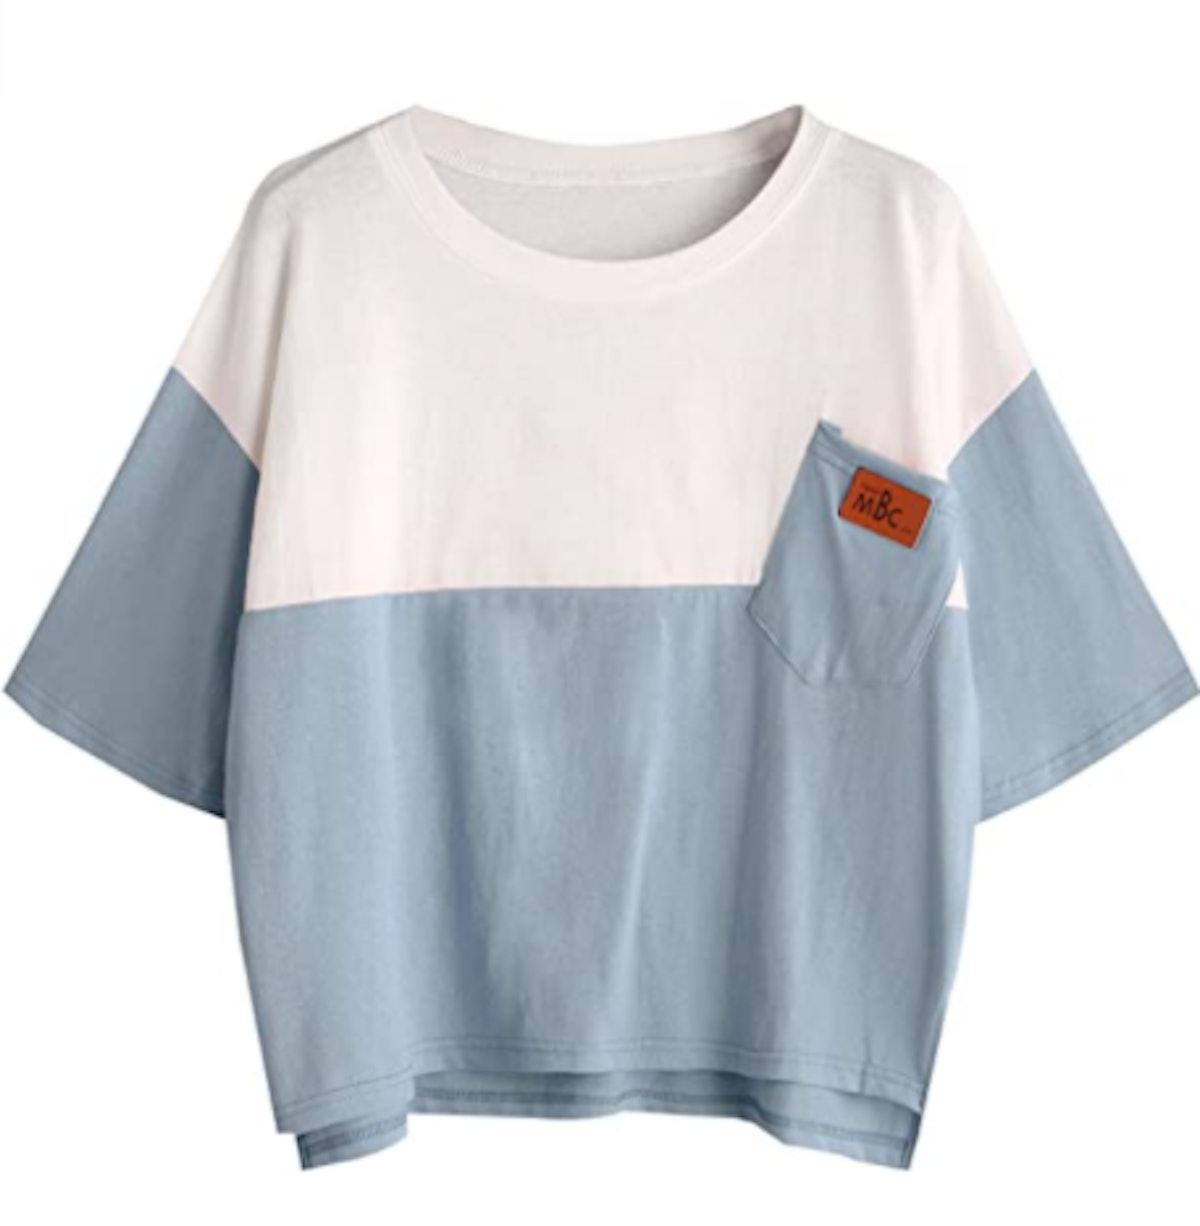 SweatyRocks Casual Loose T-Shirt